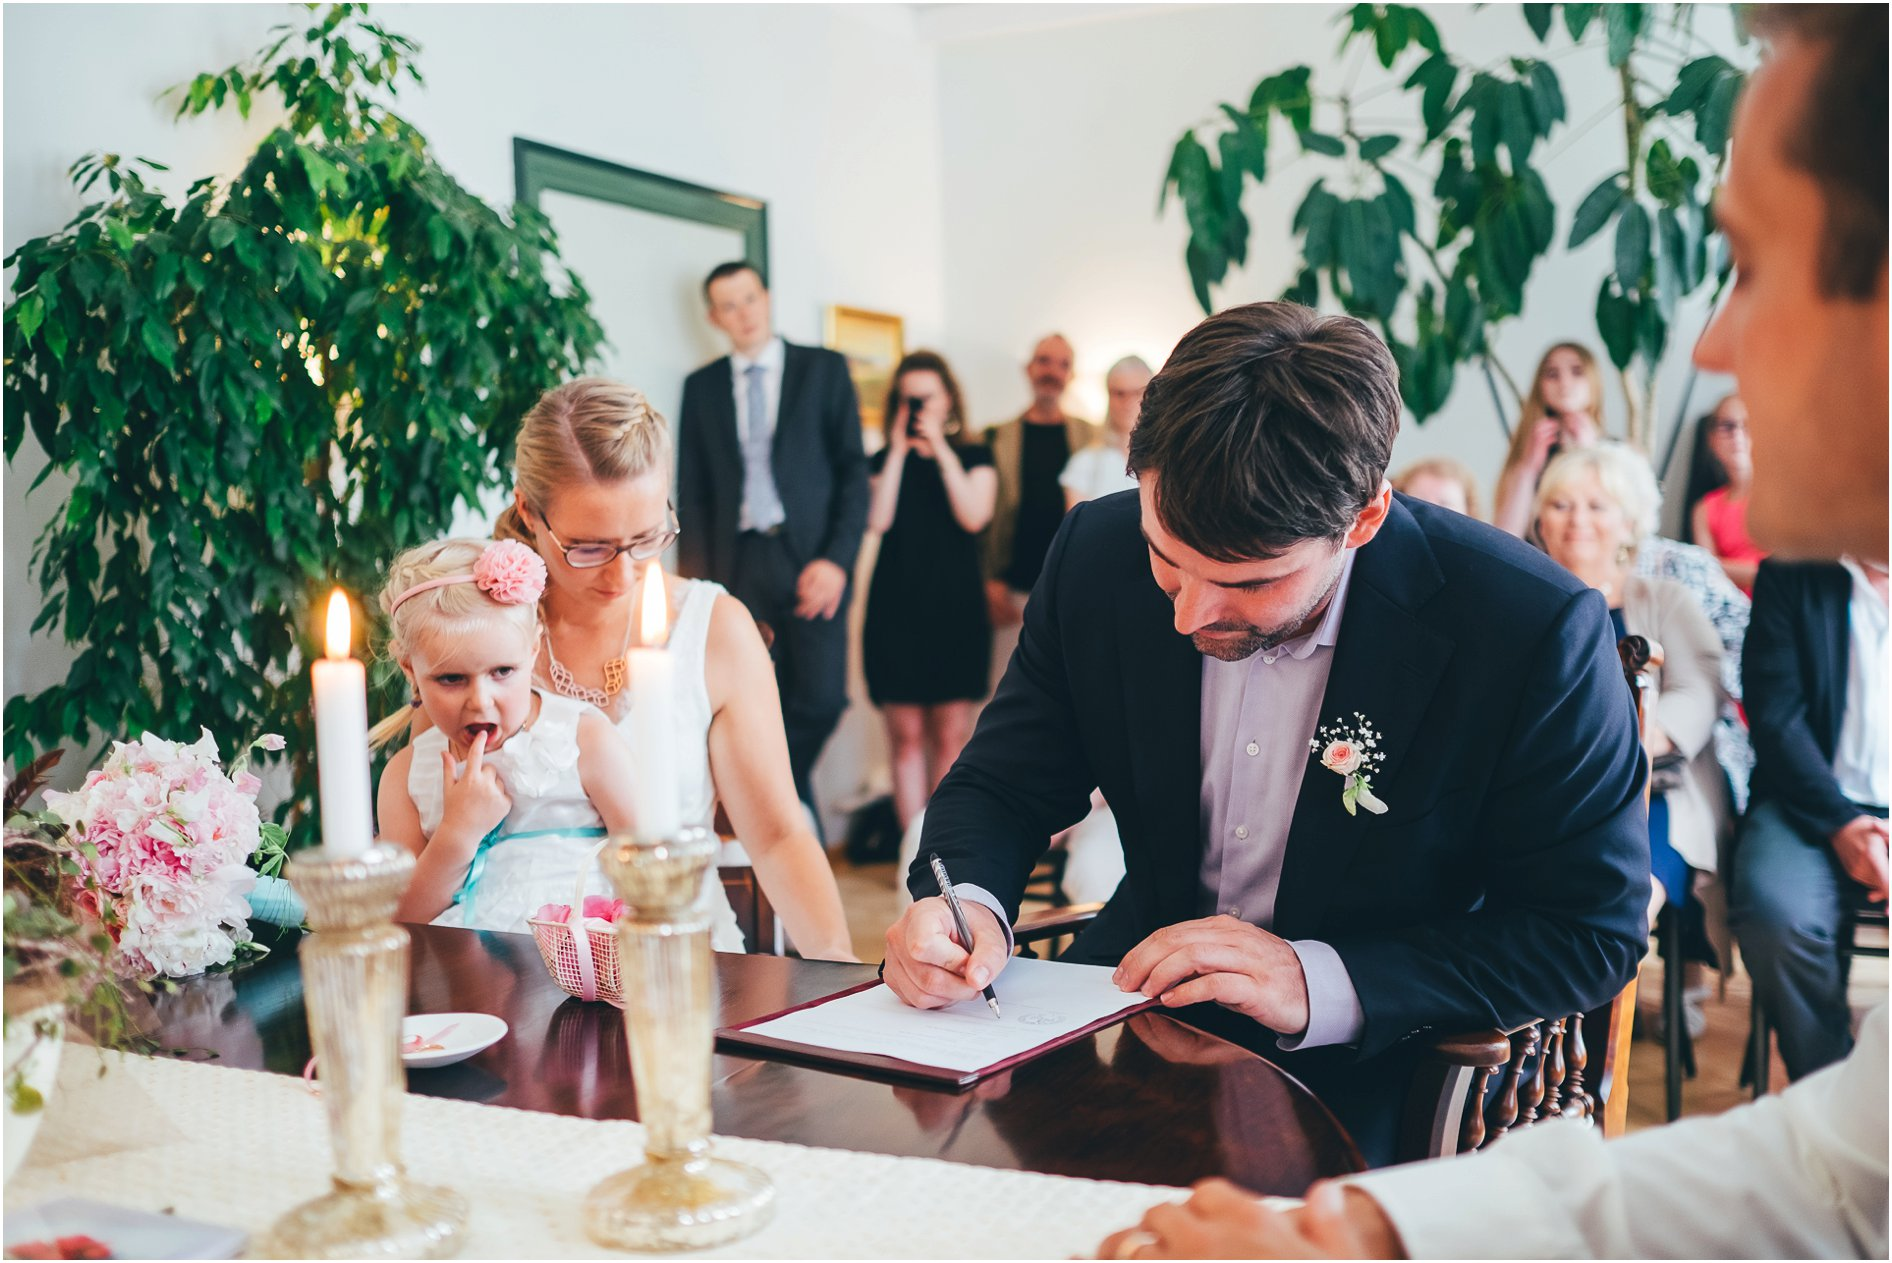 2016-04-19_0027 Sandra & Janis - Hochzeitsfotograf in Seevetal